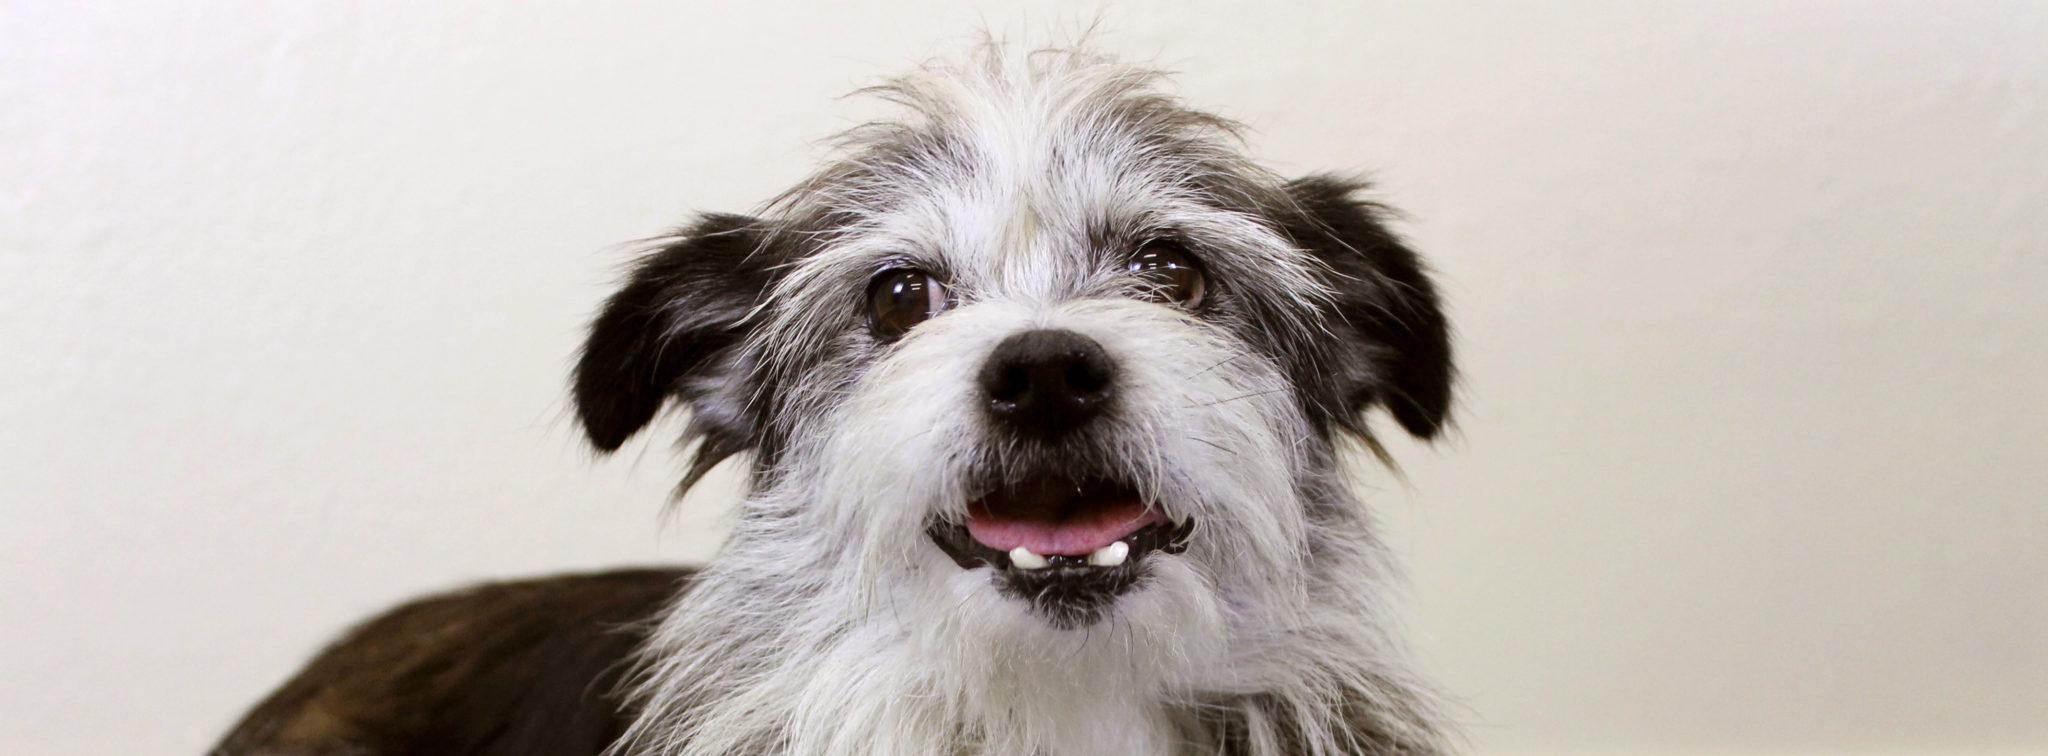 fluffy black and white dog smiling